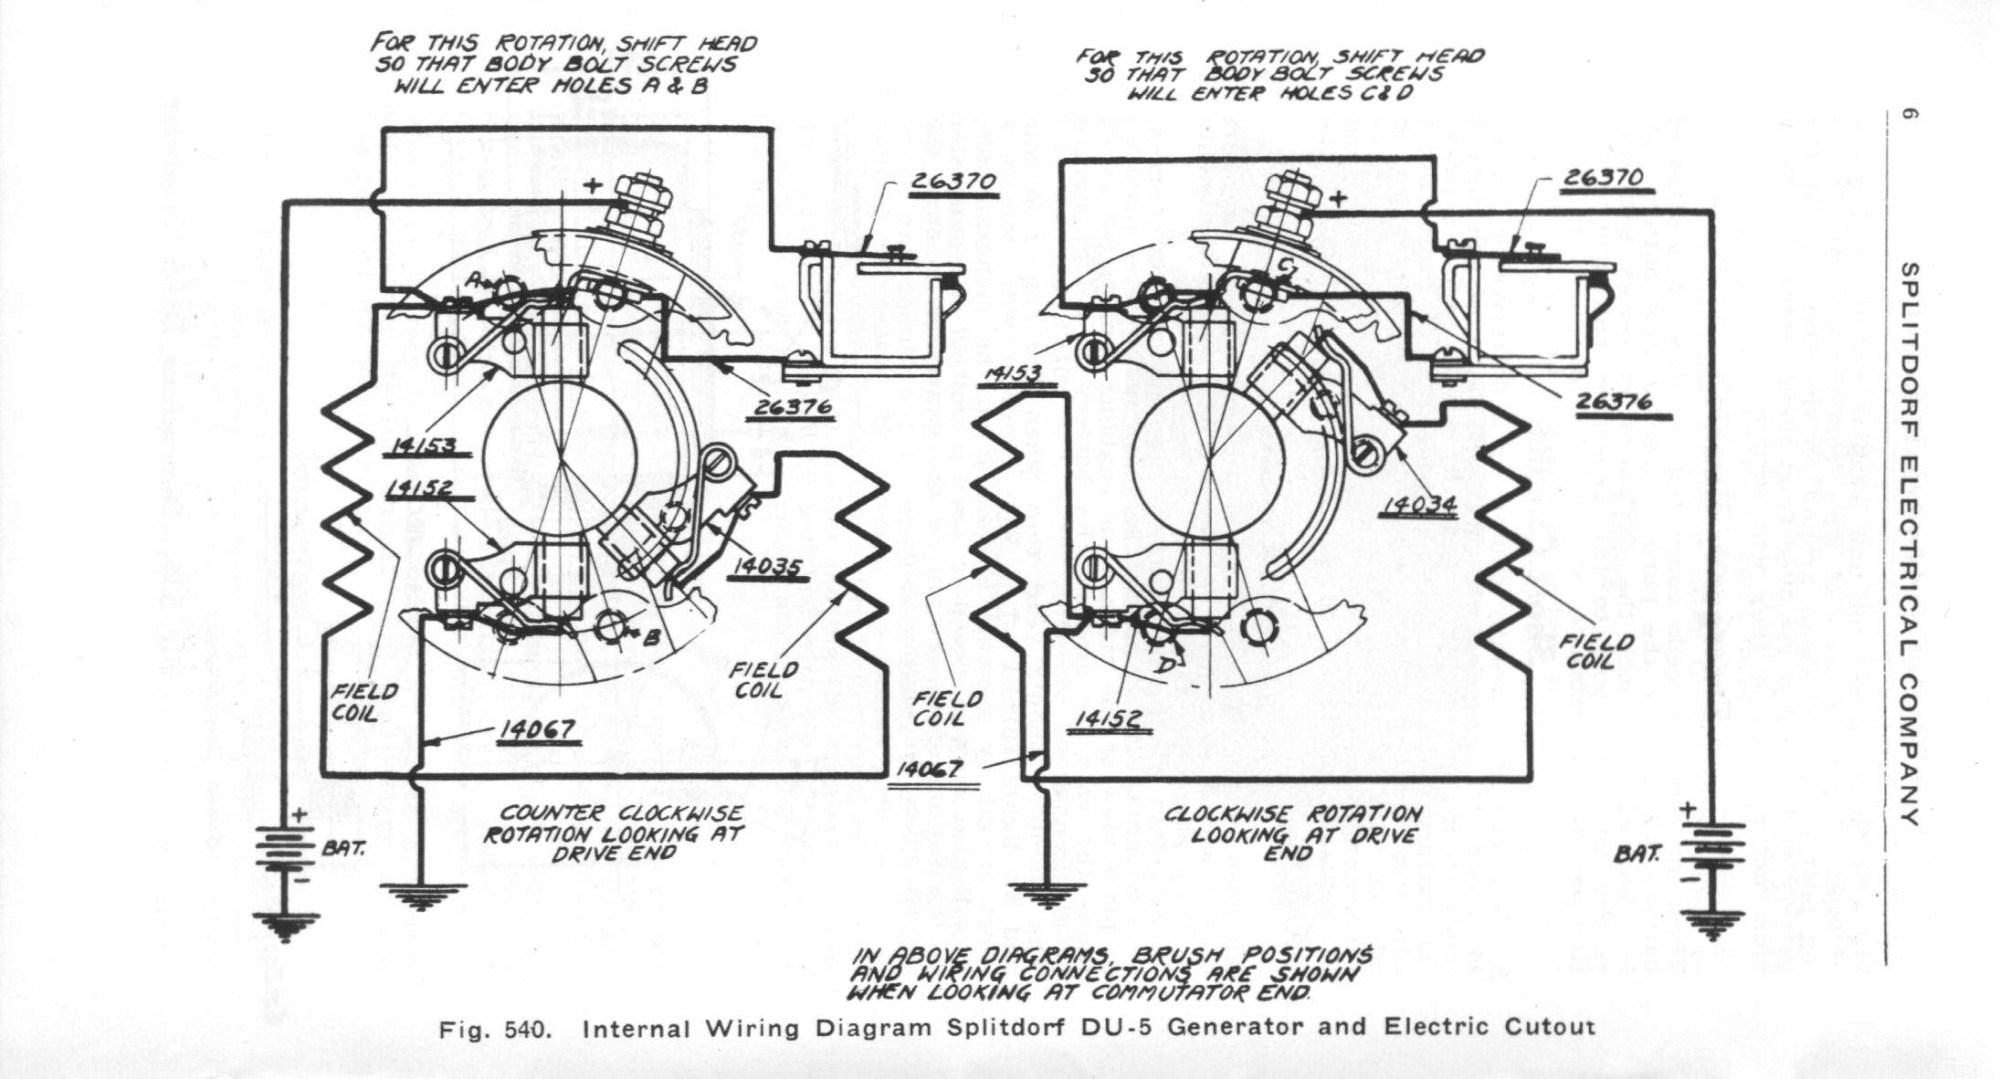 hight resolution of 2003 polari trail bos wiring diagram